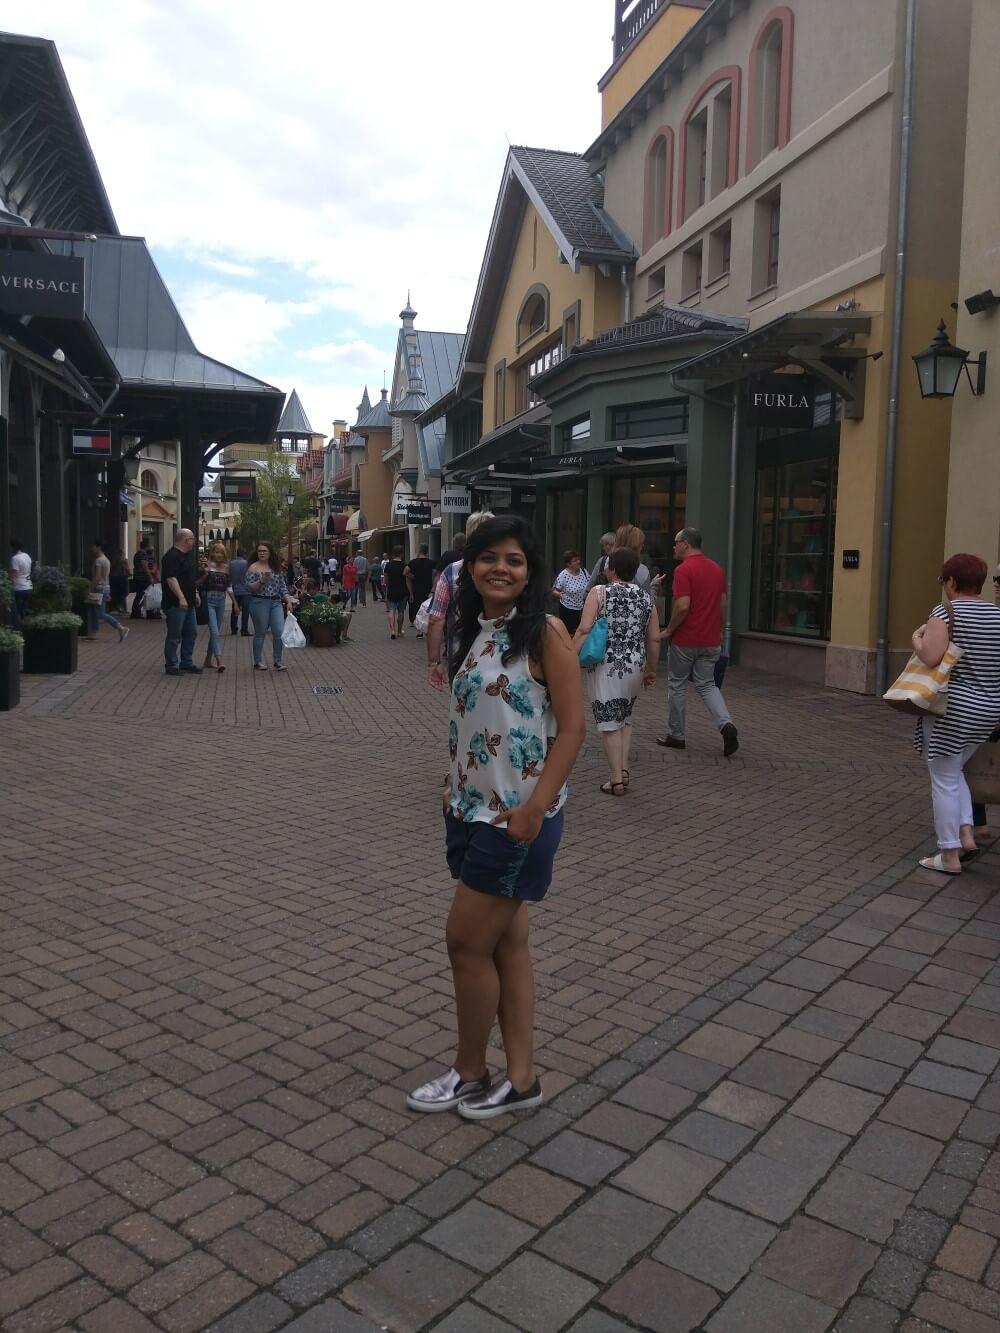 frankfurt-young-female-traveler-travelpeppy